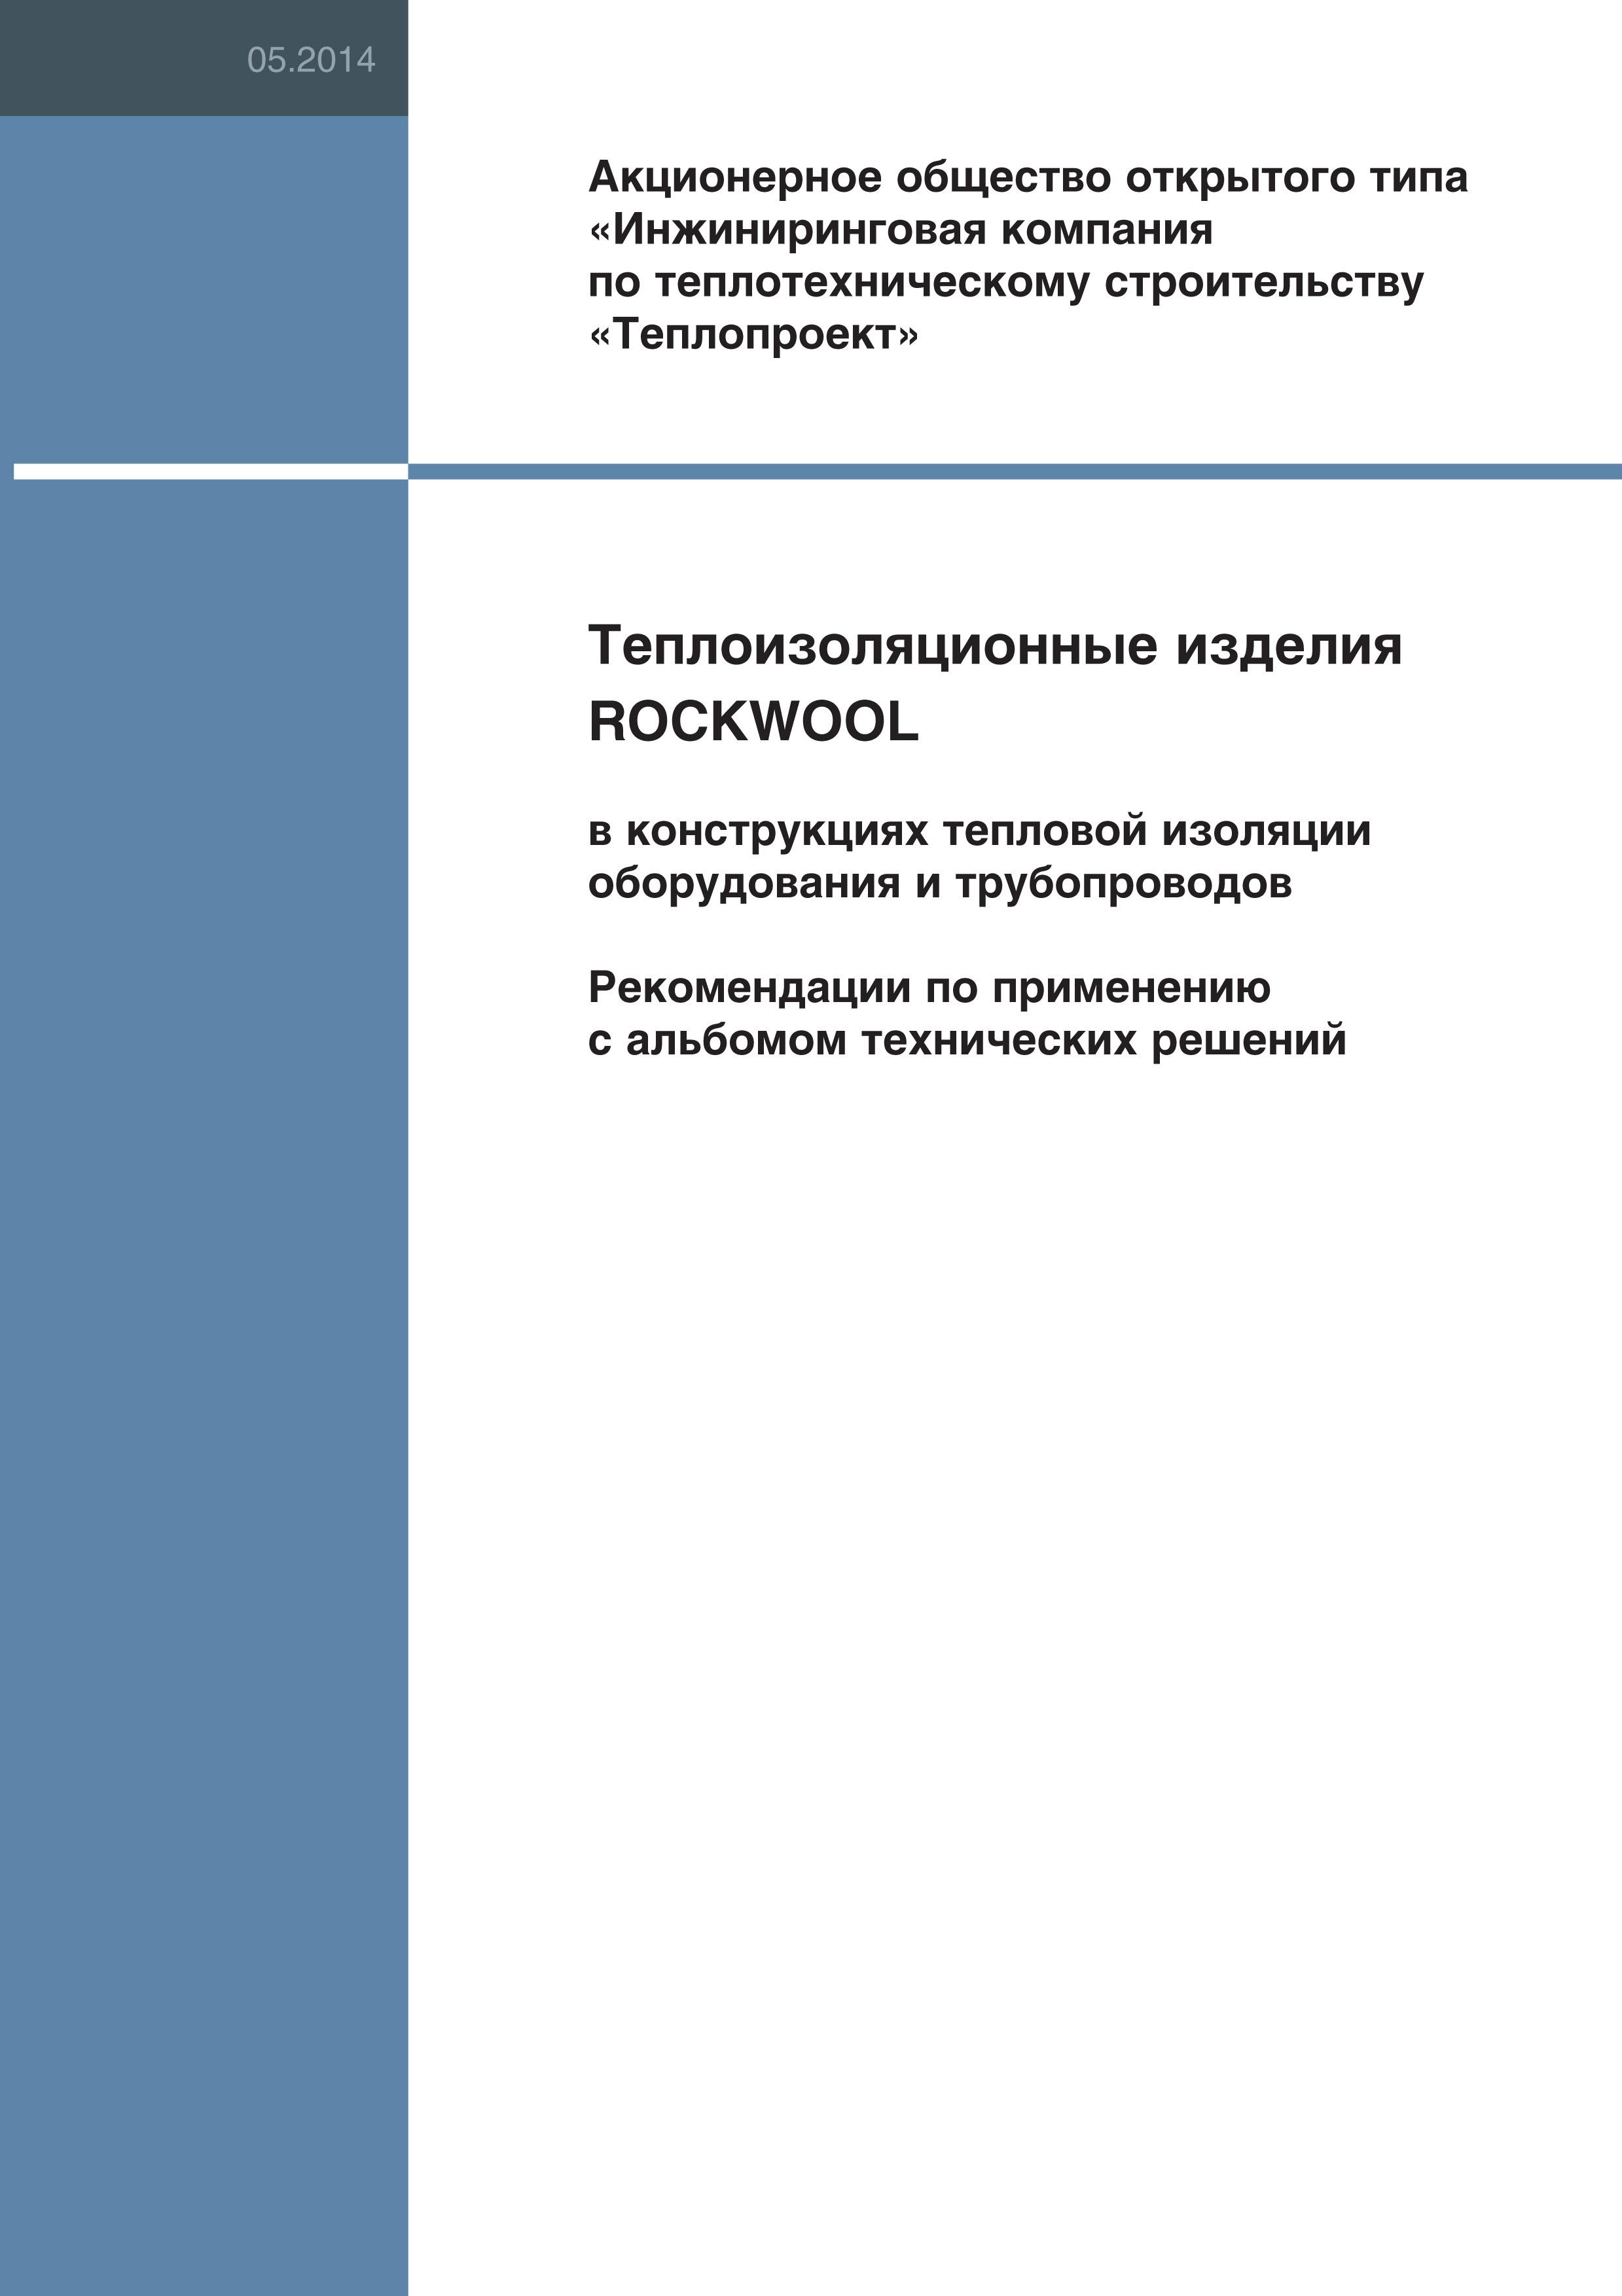 изоляция термафлекс инструкция по монтажу